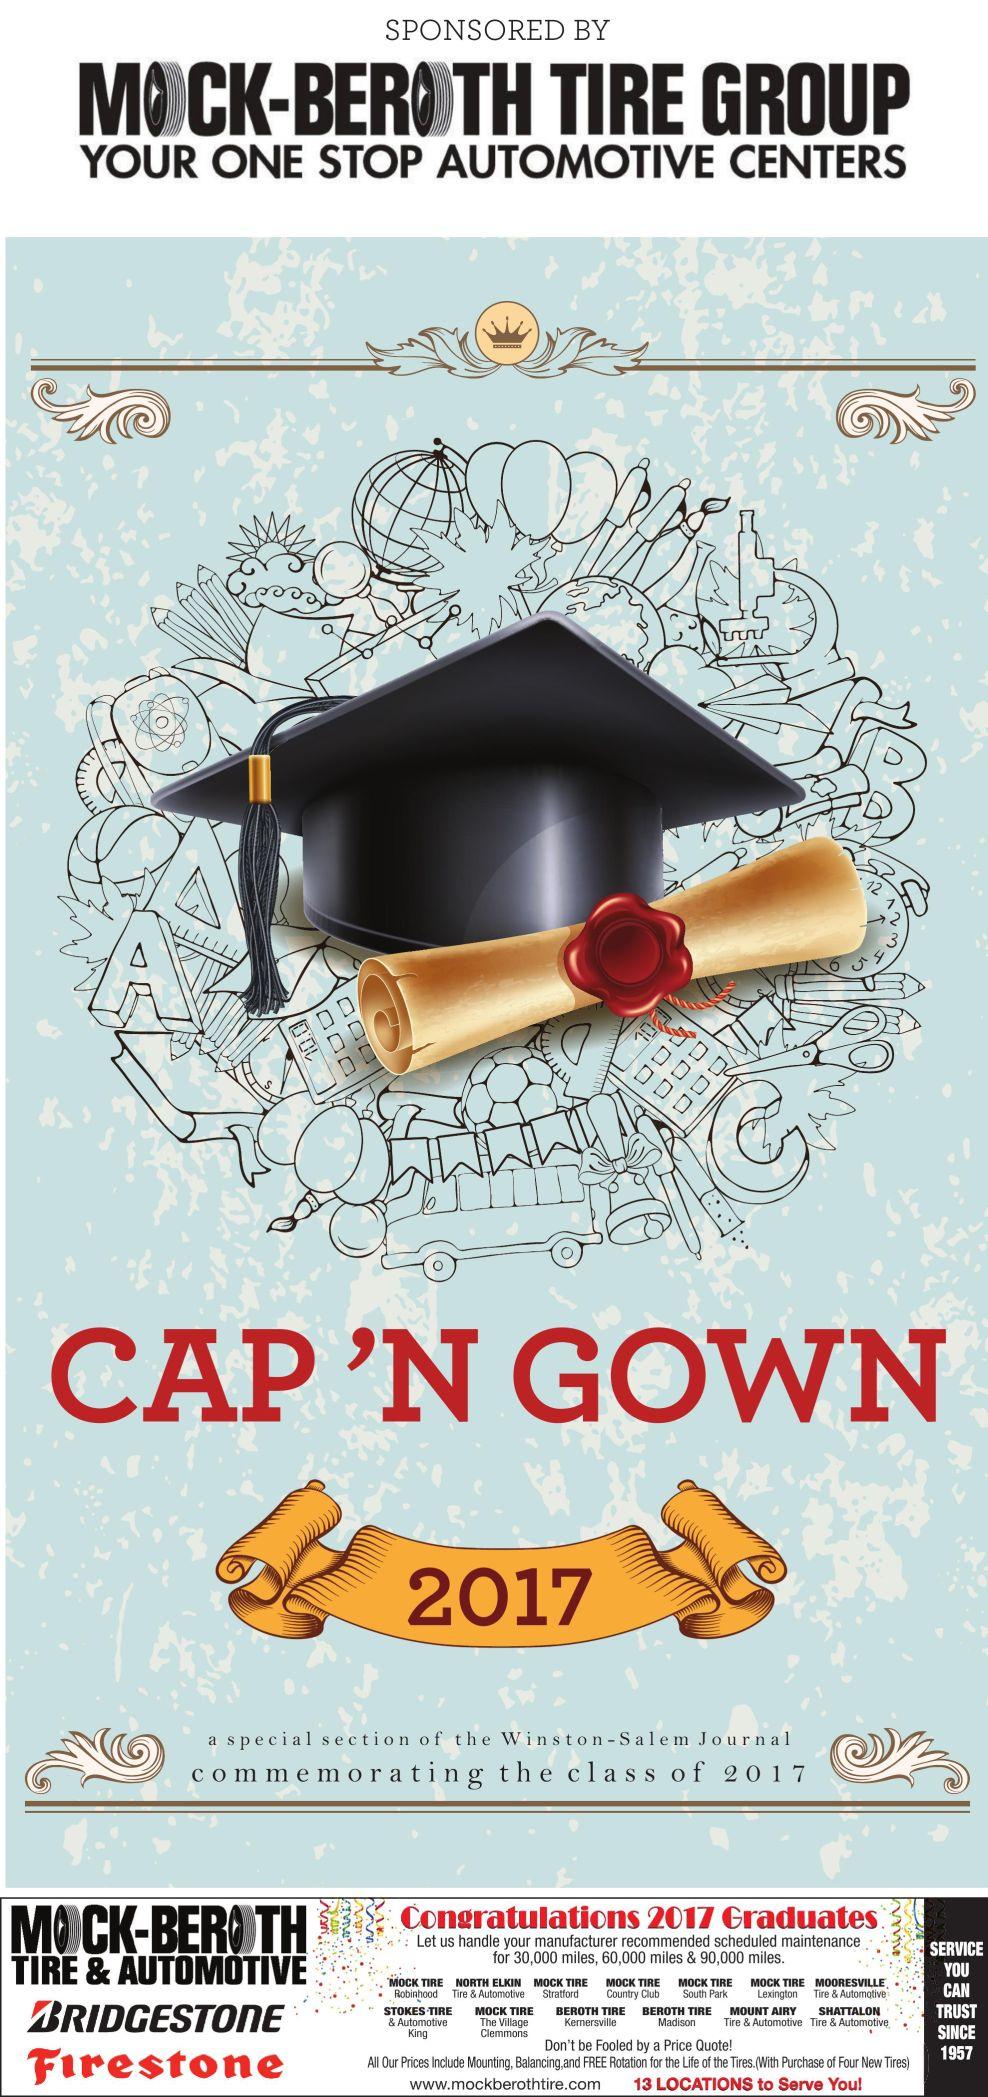 2017 Graduation Winston-Salem Journal Special Section